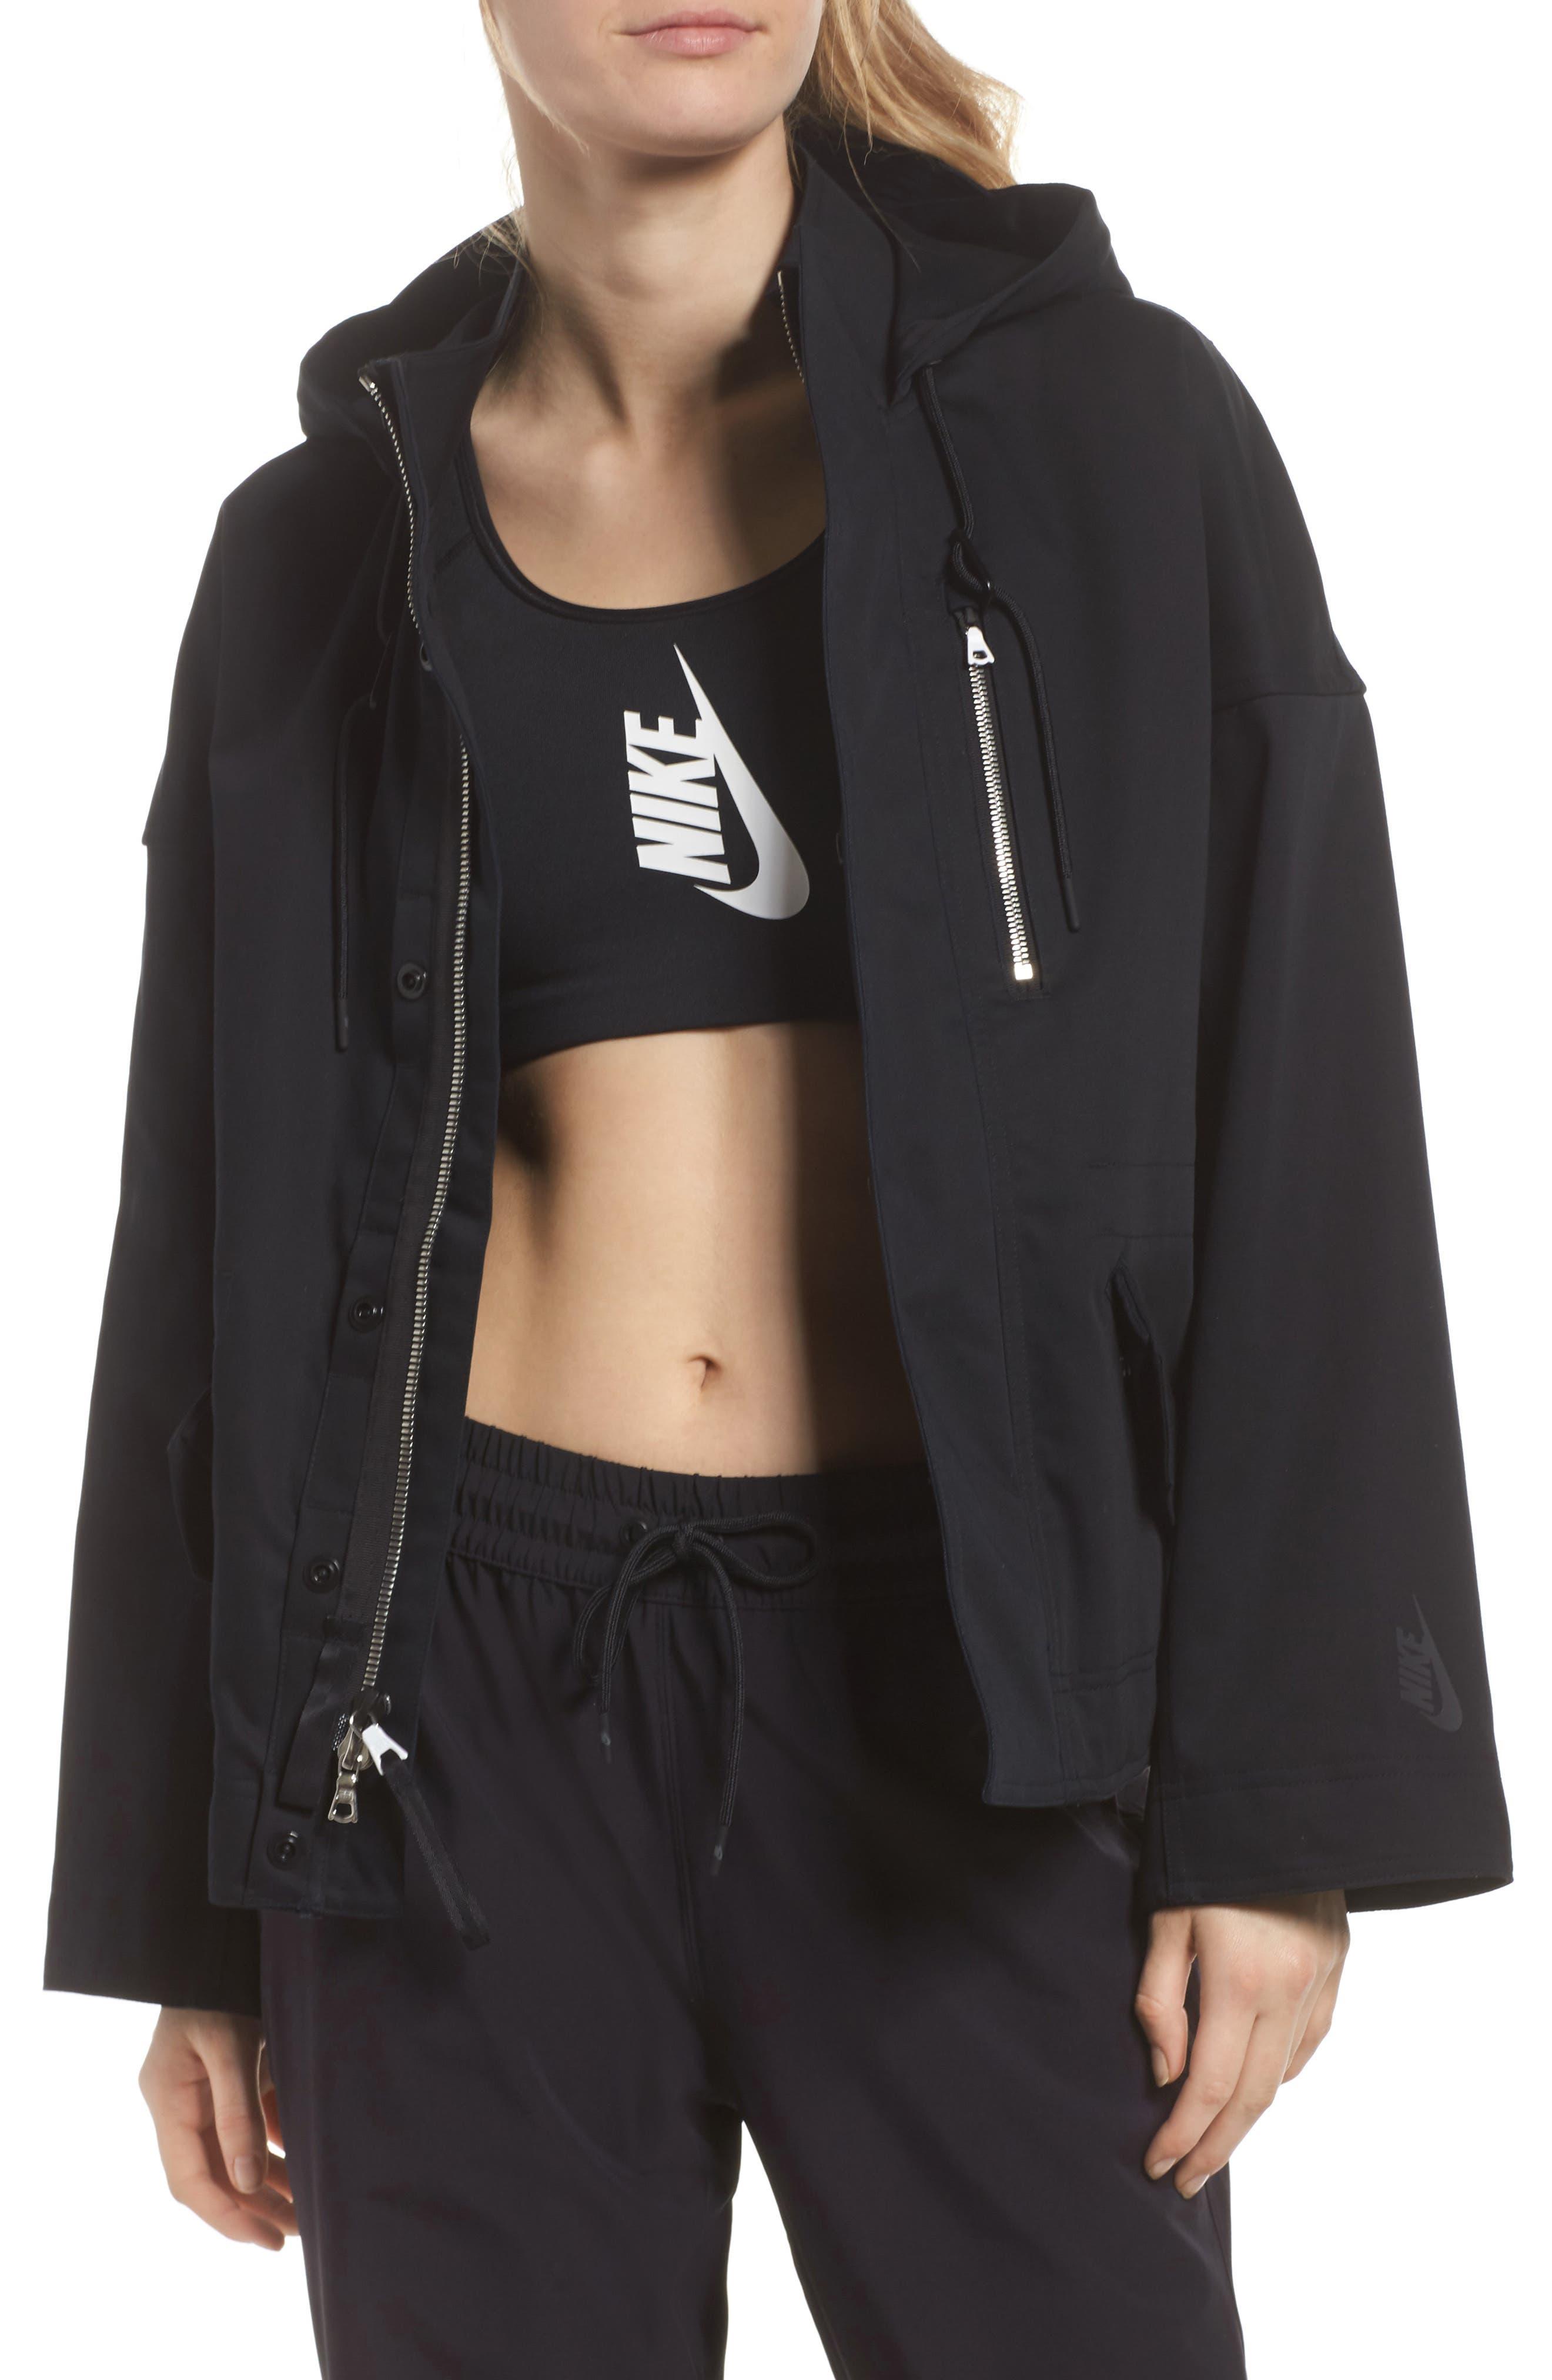 NikeLab Collection Women's Tactical Jacket,                             Main thumbnail 1, color,